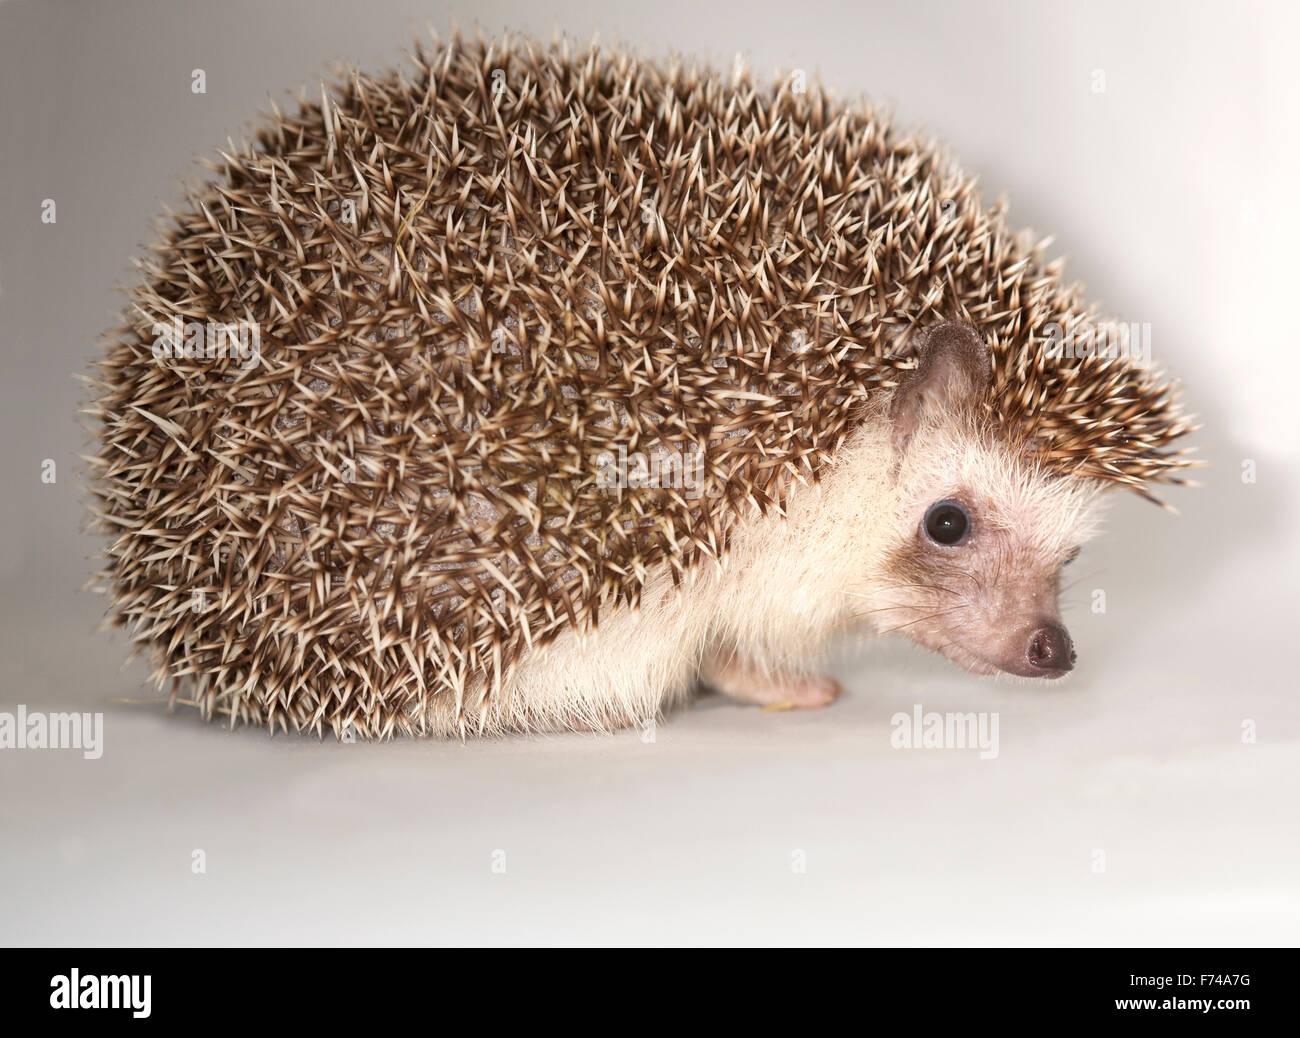 African Pygmy Hedgehog - Stock Image